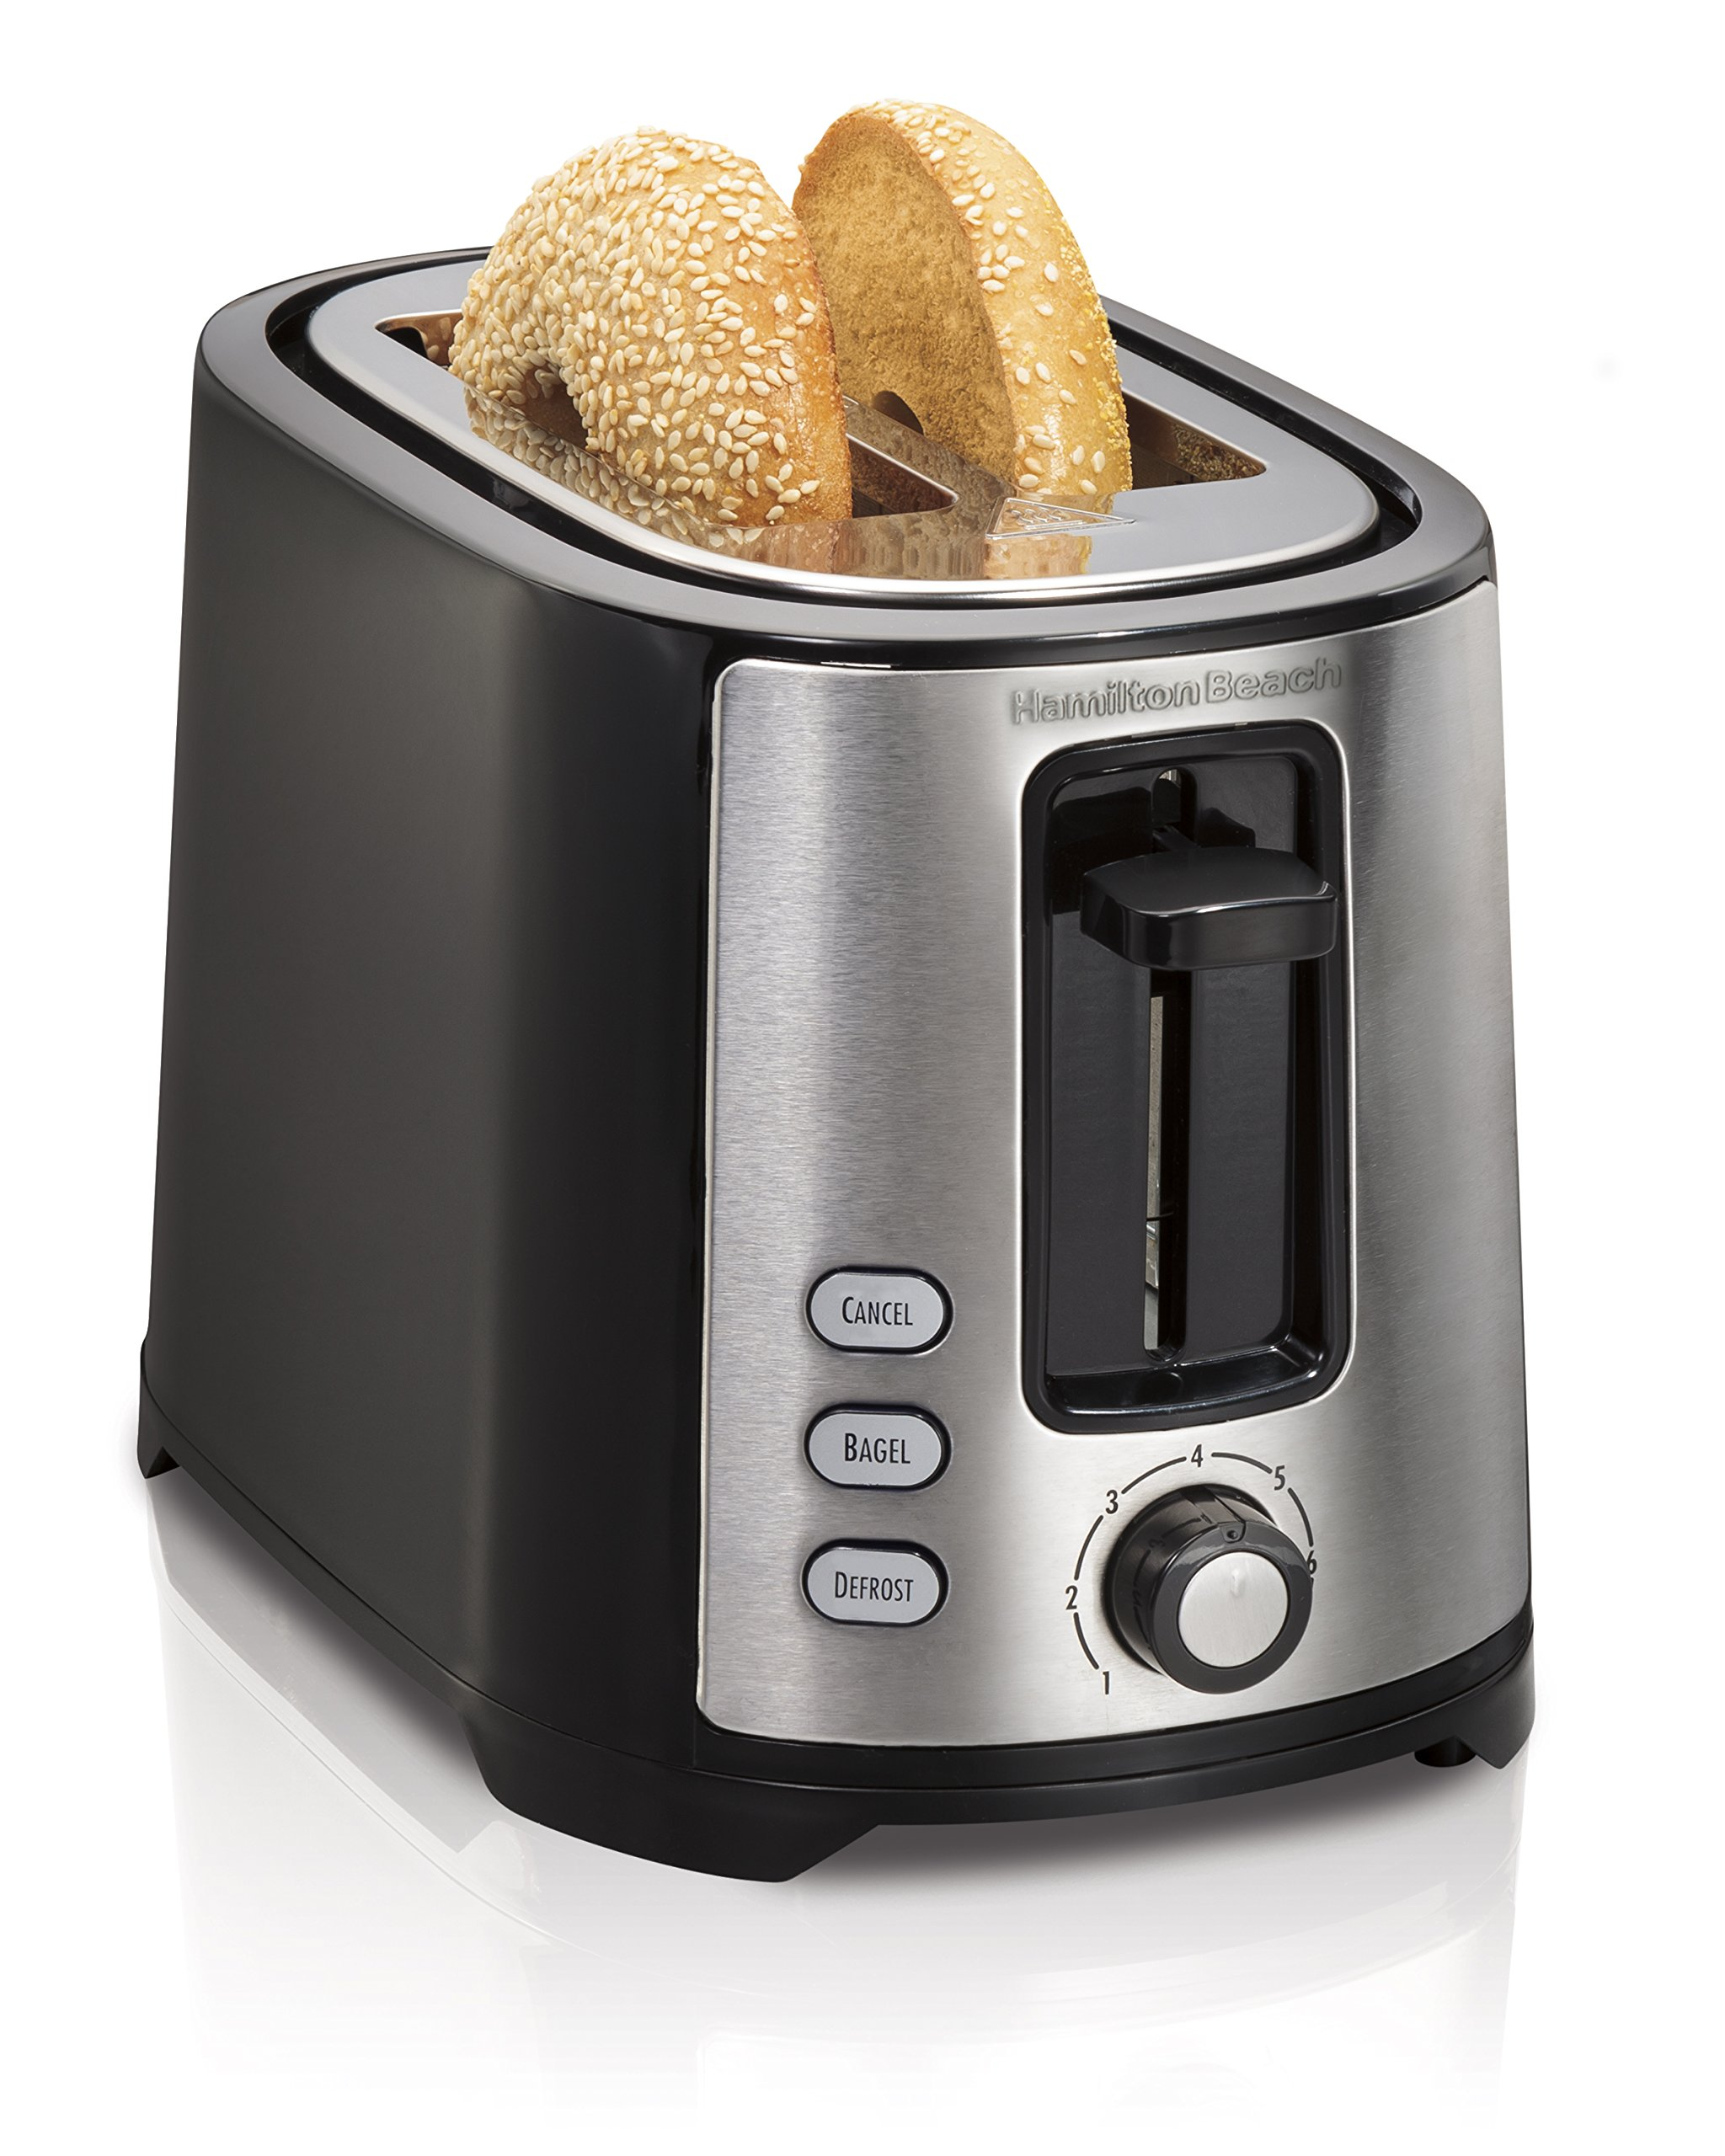 Hamilton Beach 2-Slice Extra-Wide Slot Toaster with Shade Selector, Toast Boost, Cool Wall, Auto Shutoff, Black (22633) by Hamilton Beach